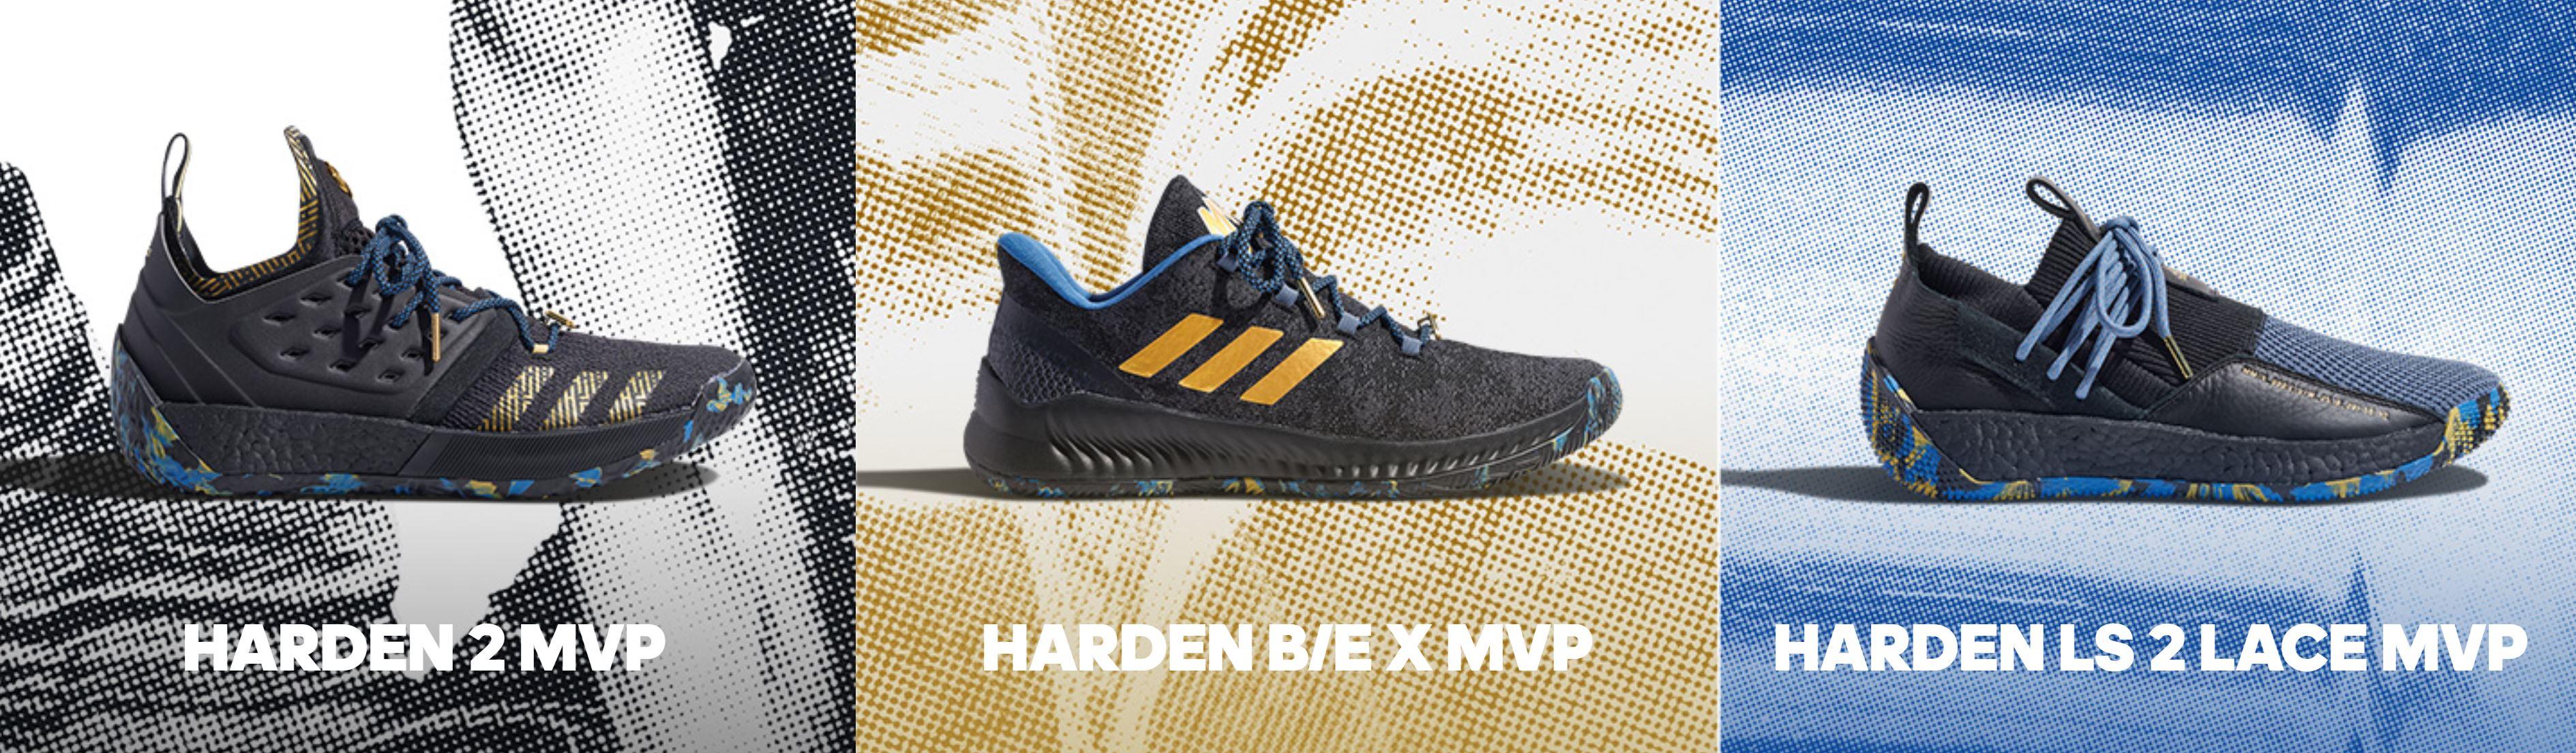 bd597ec826d adidas harden mvp pack - WearTesters